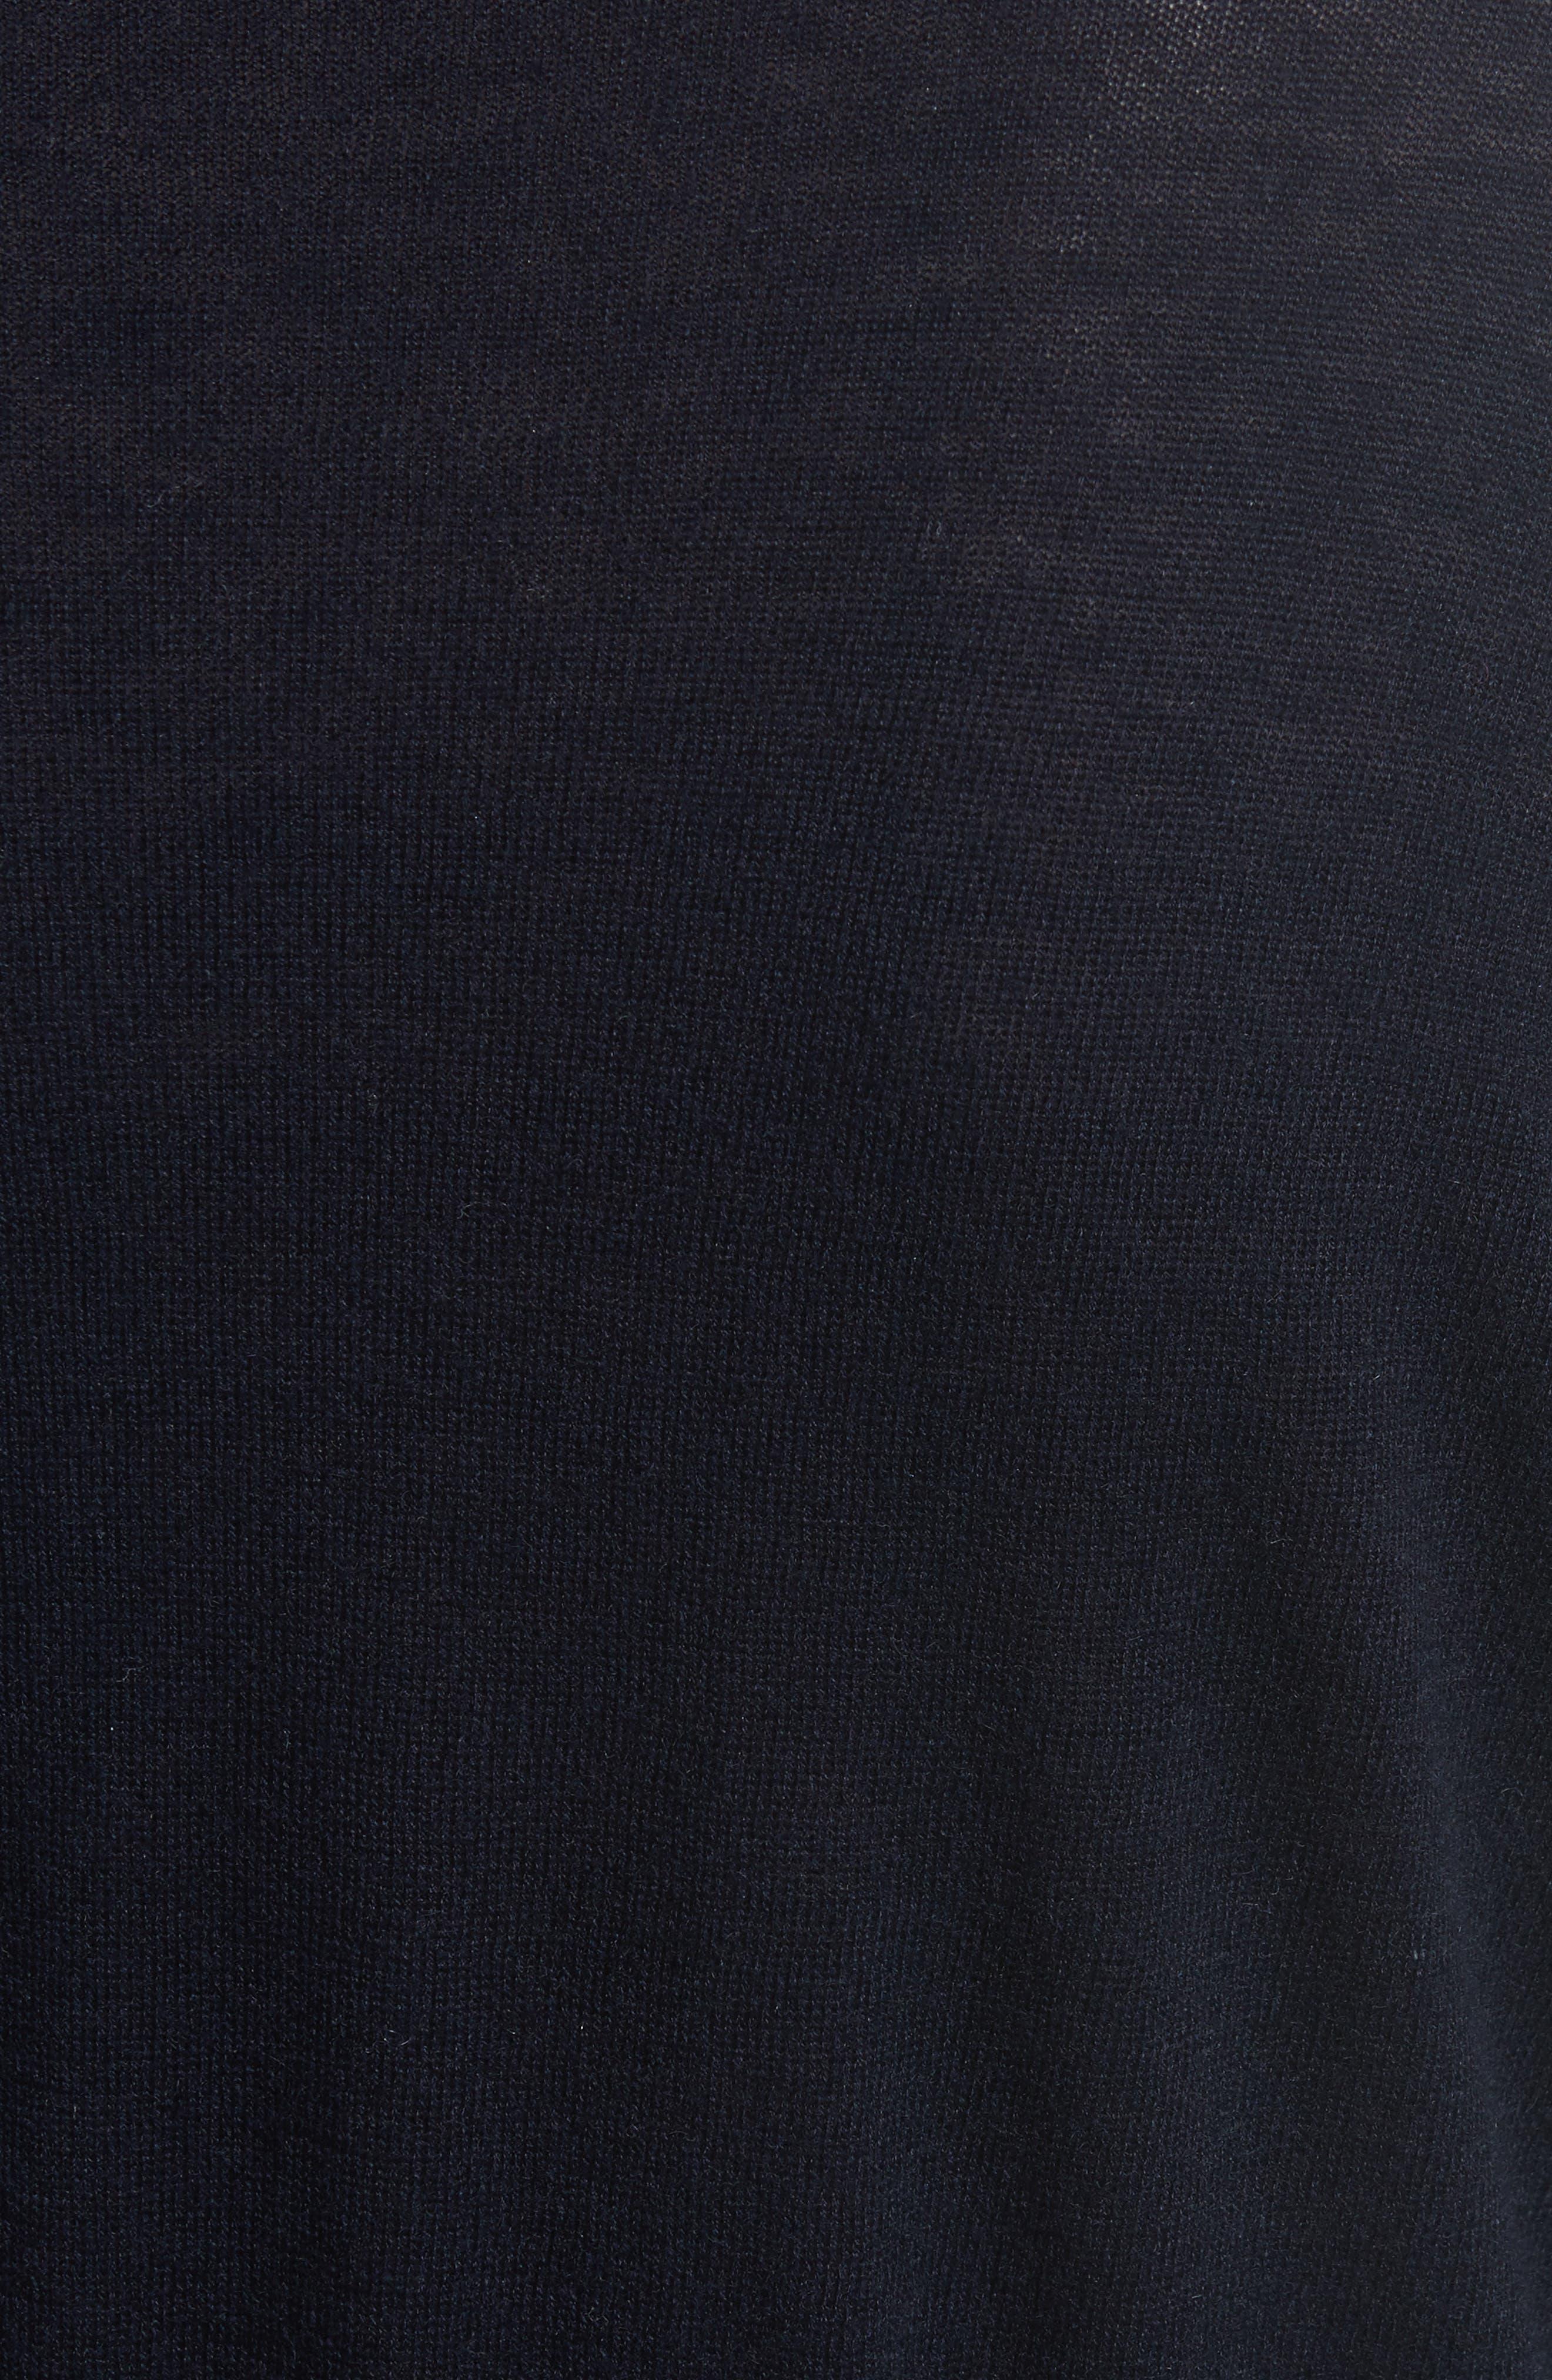 Ruffle Sleeve Silk & Cashmere Sweater,                             Alternate thumbnail 5, color,                             410